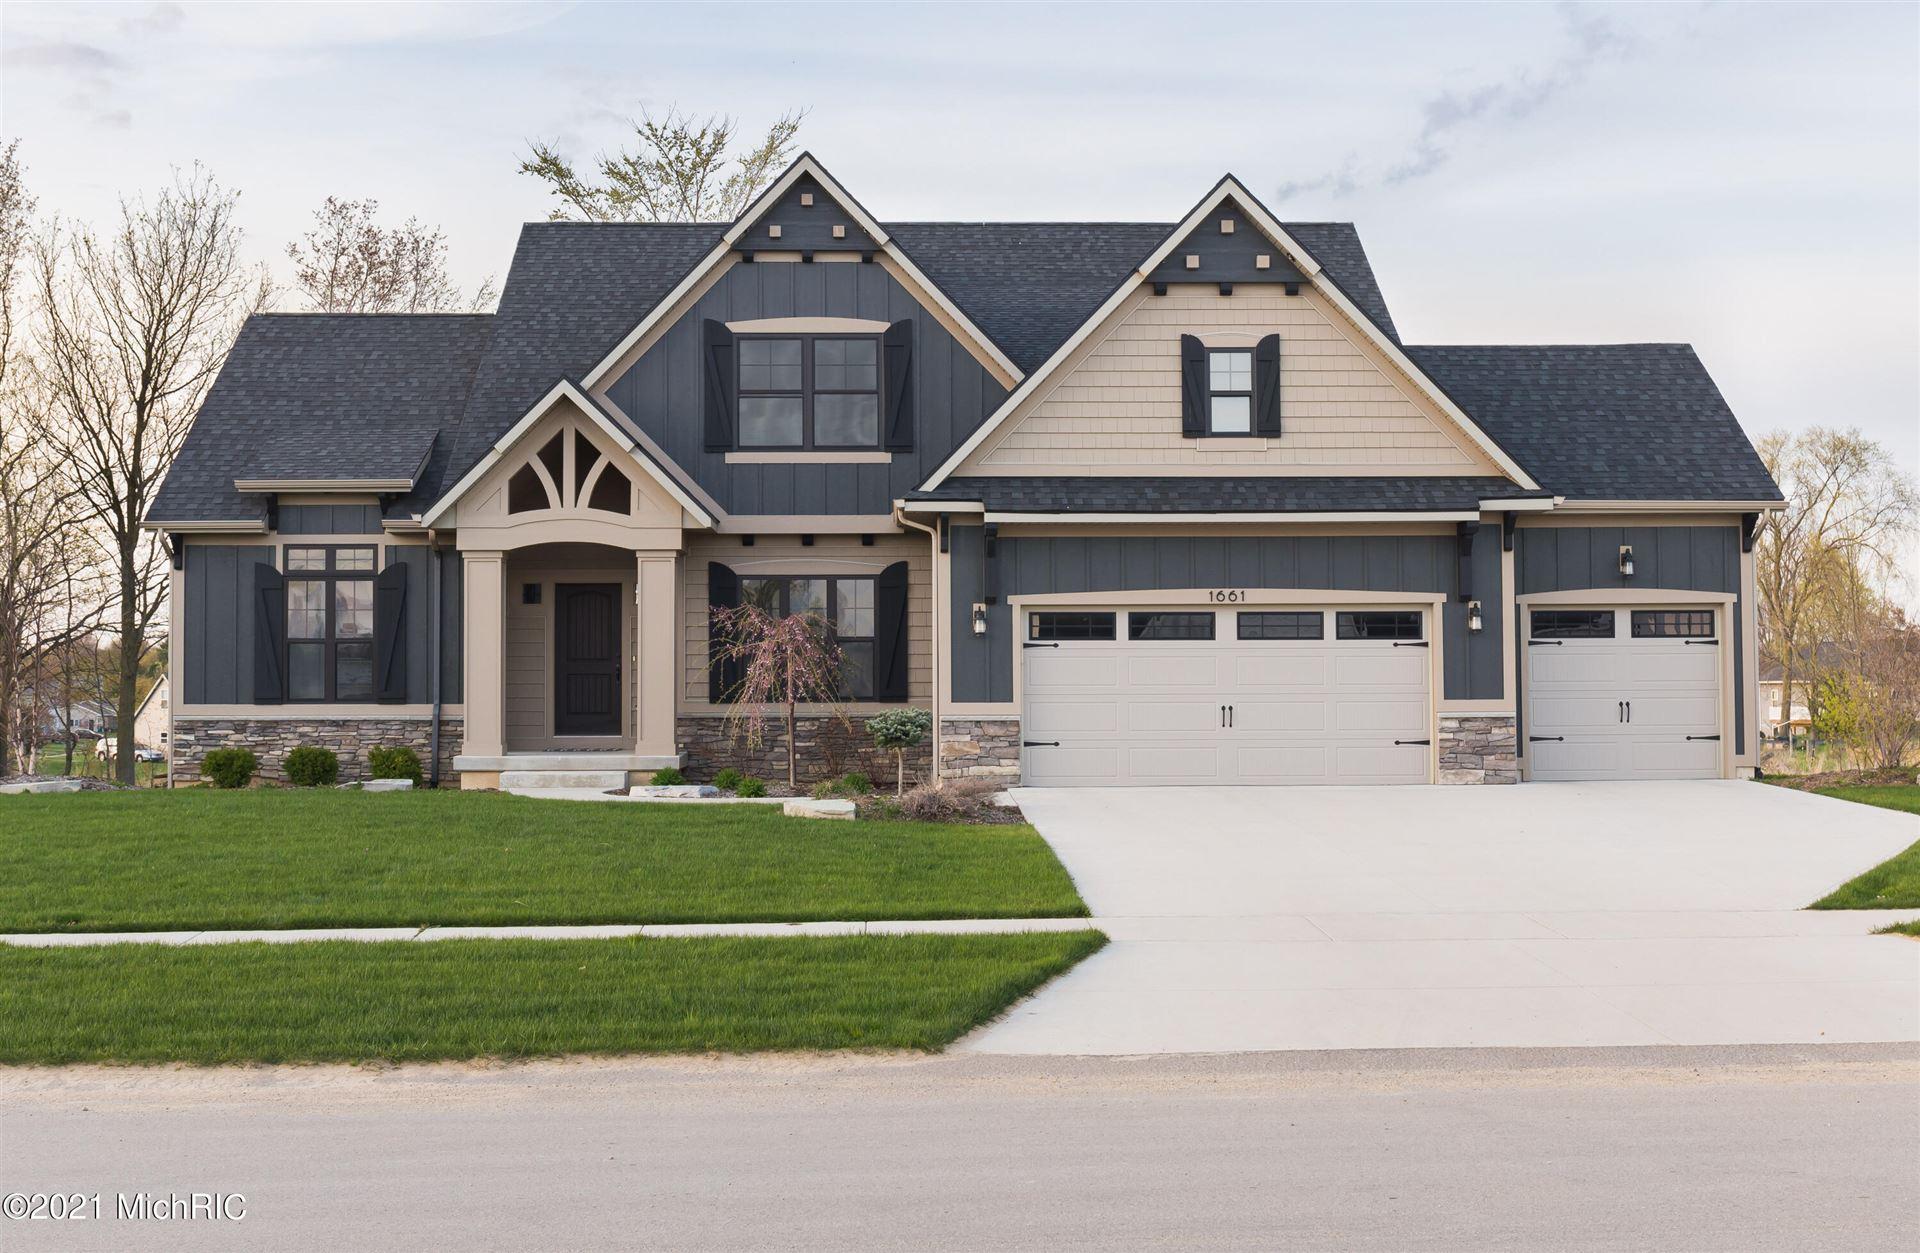 4896 Prairie River Drive SE, Grand Rapids, MI 49512 - MLS#: 21021364